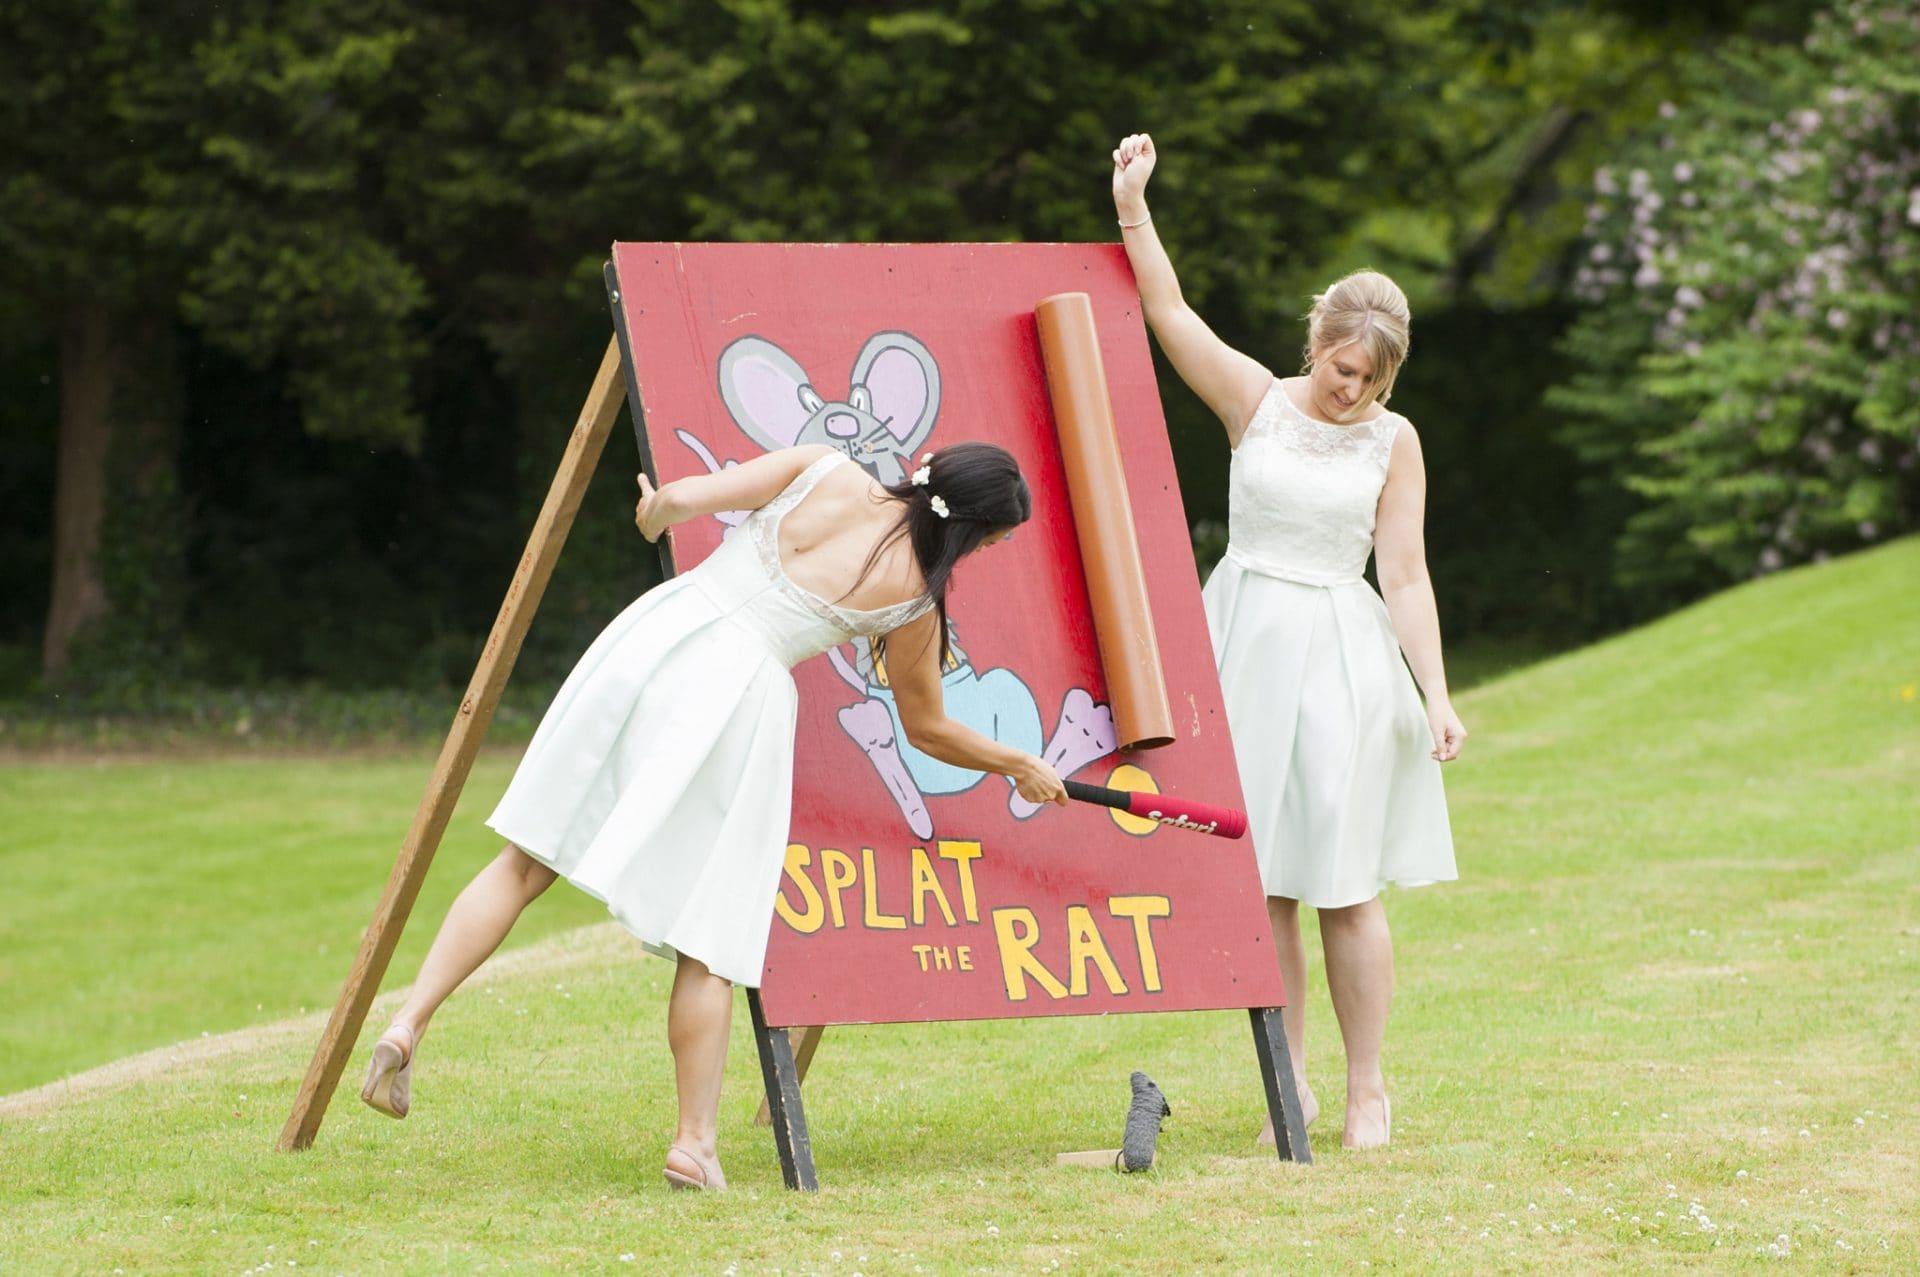 Splat the rat game at a wedding